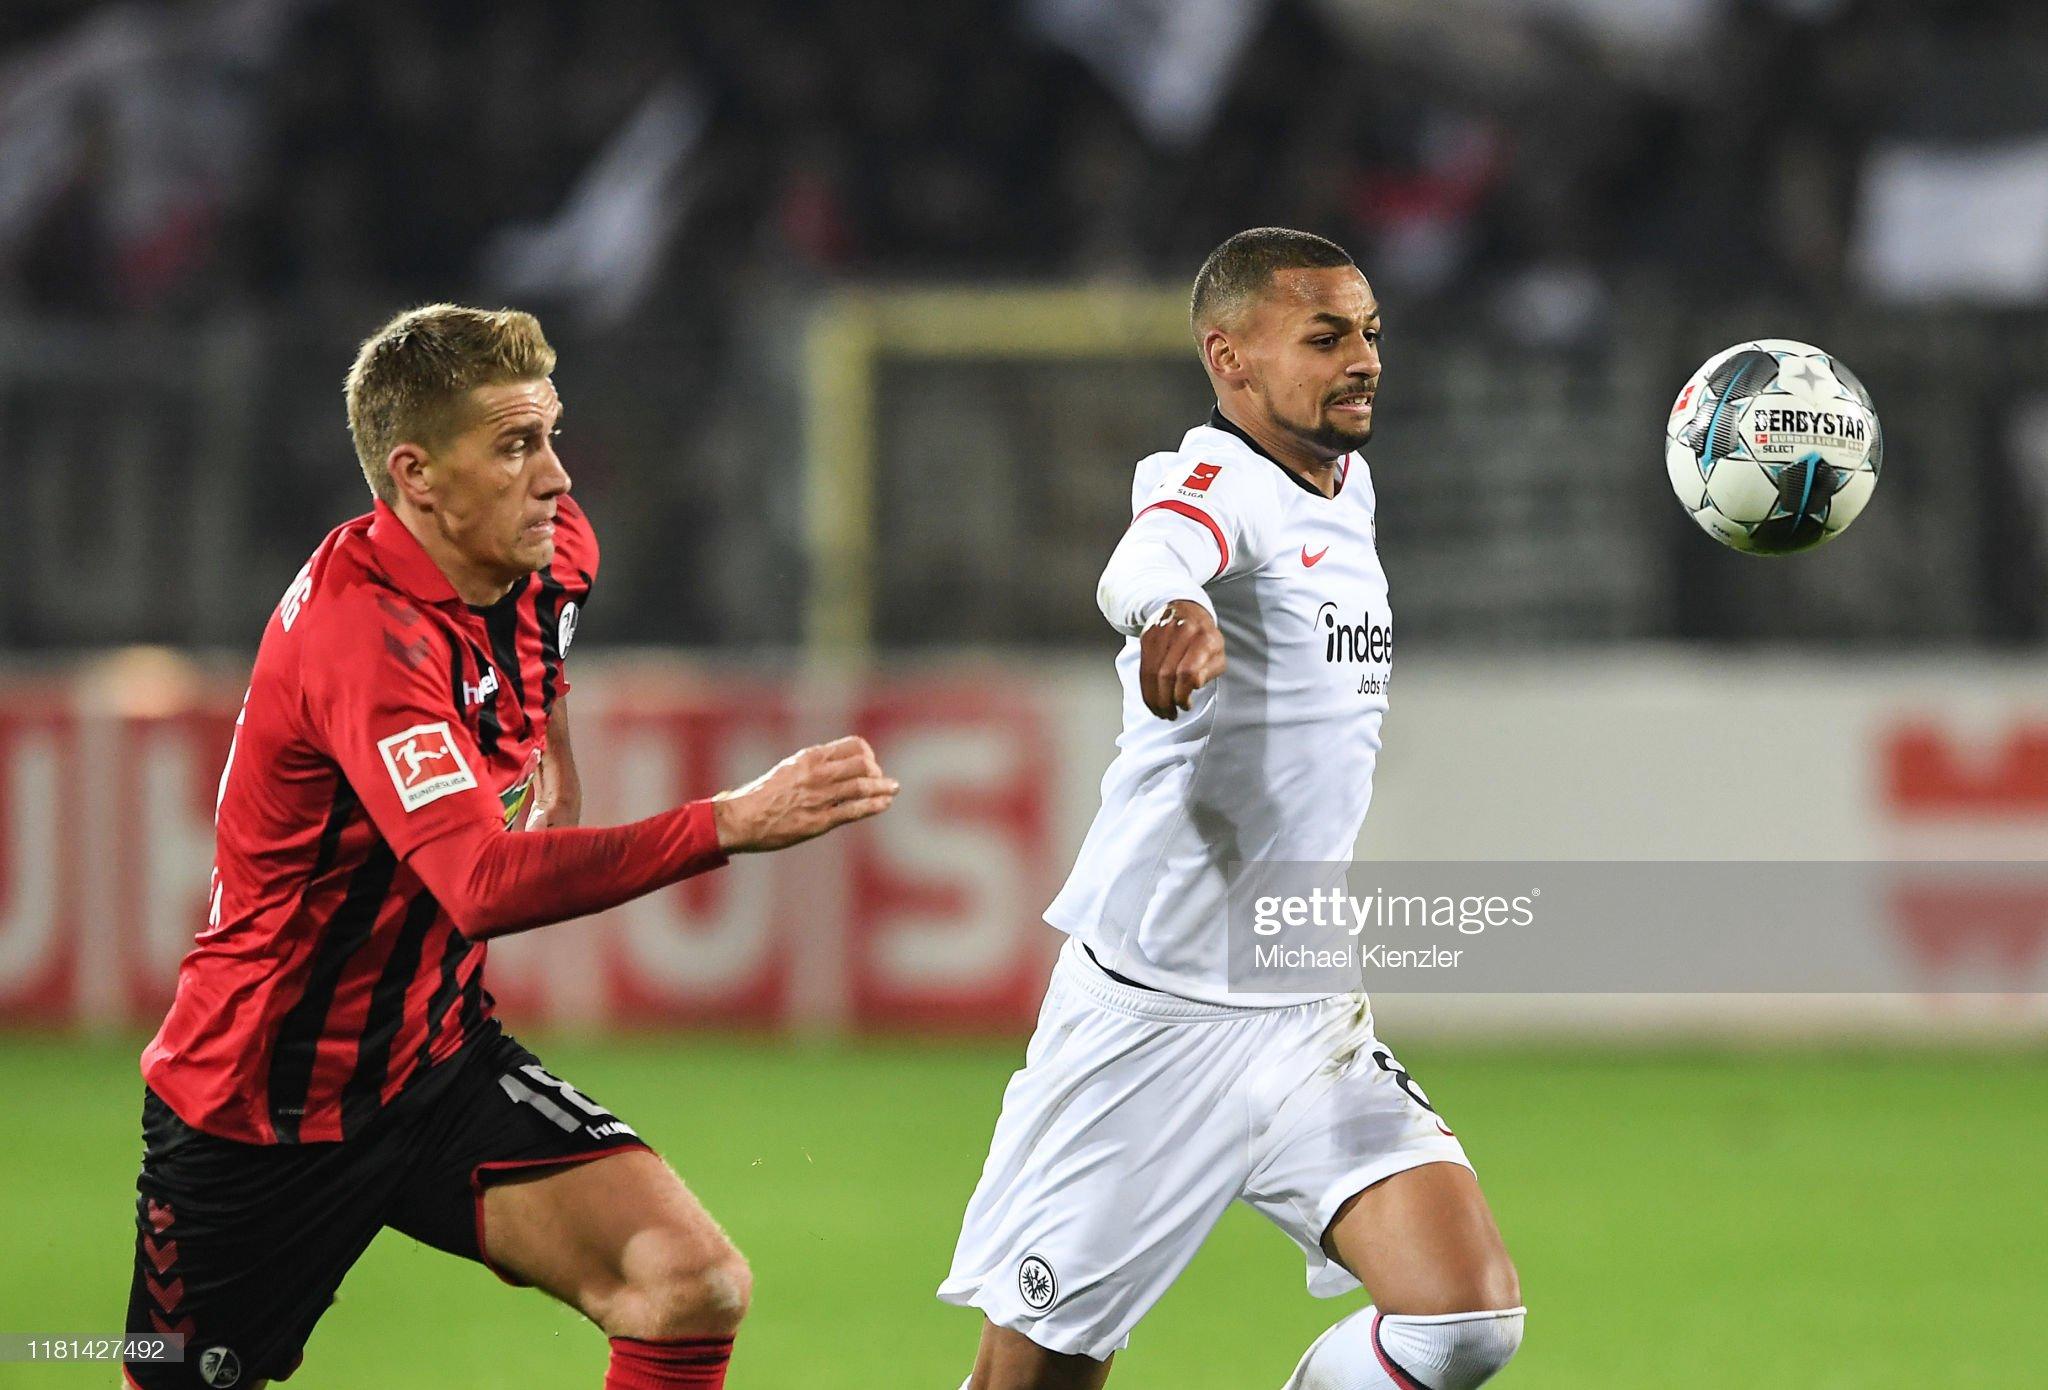 Eintracht Frankfurt vs Freiburg Preview, prediction and odds